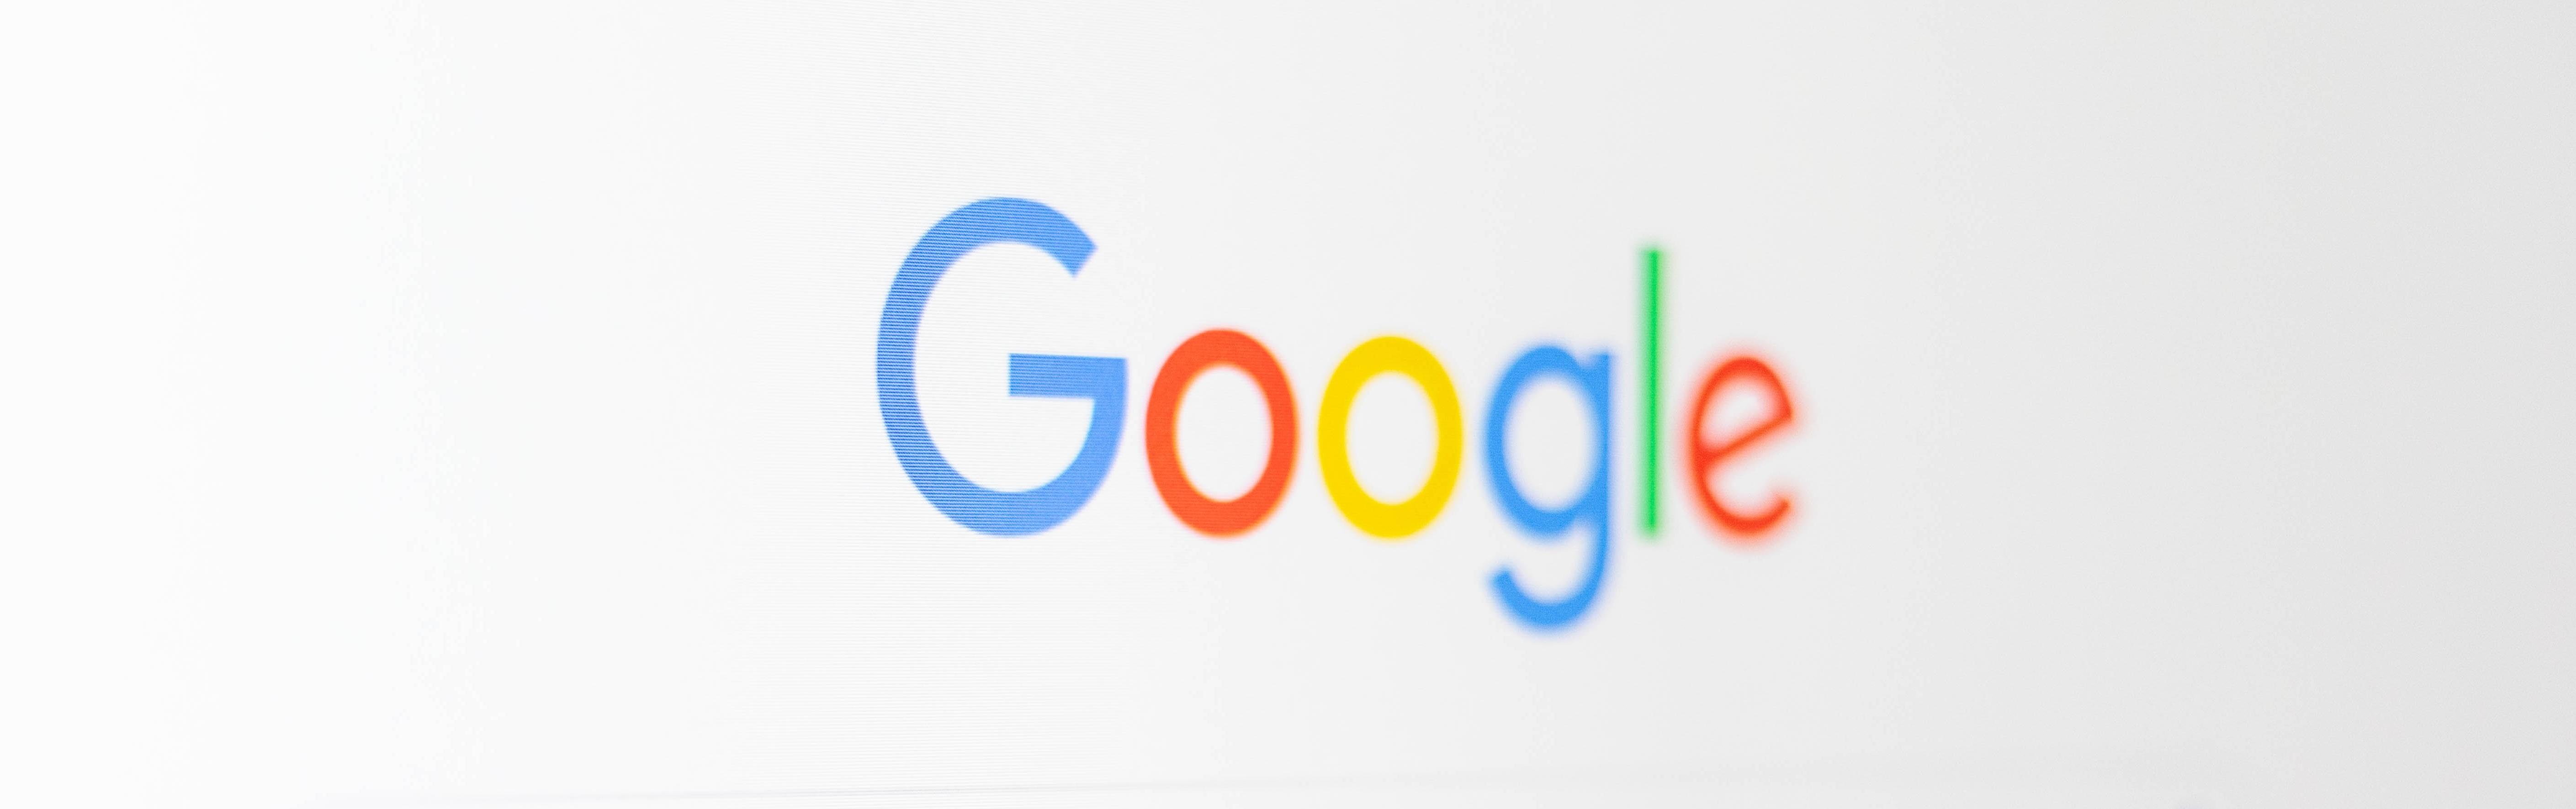 Logo van Google